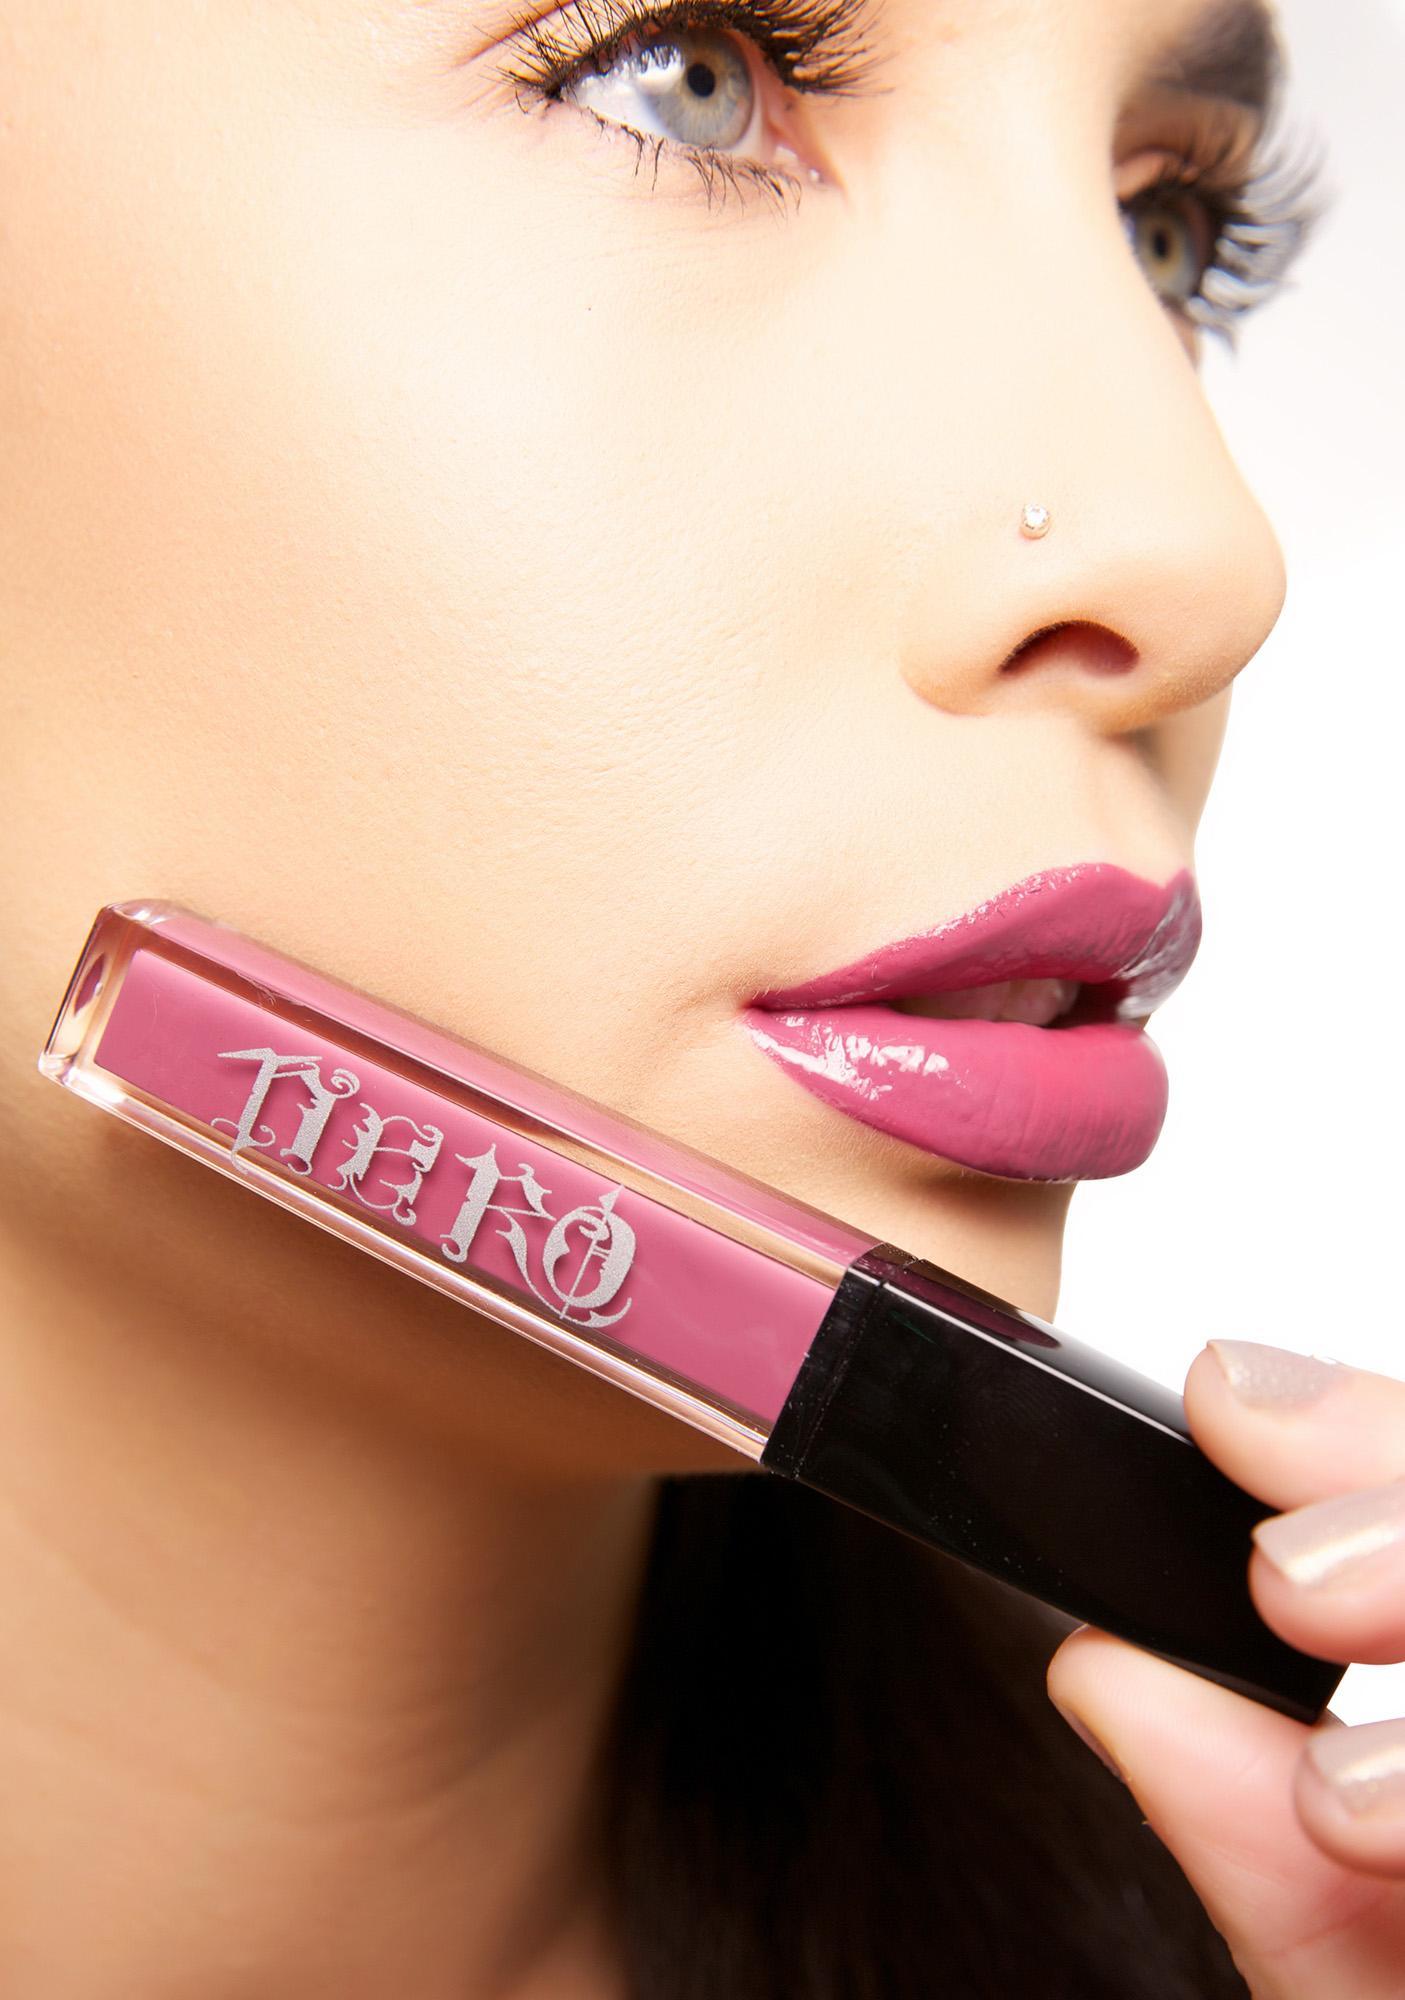 Nero Cosmetics Spellbinding Lip Vinyl